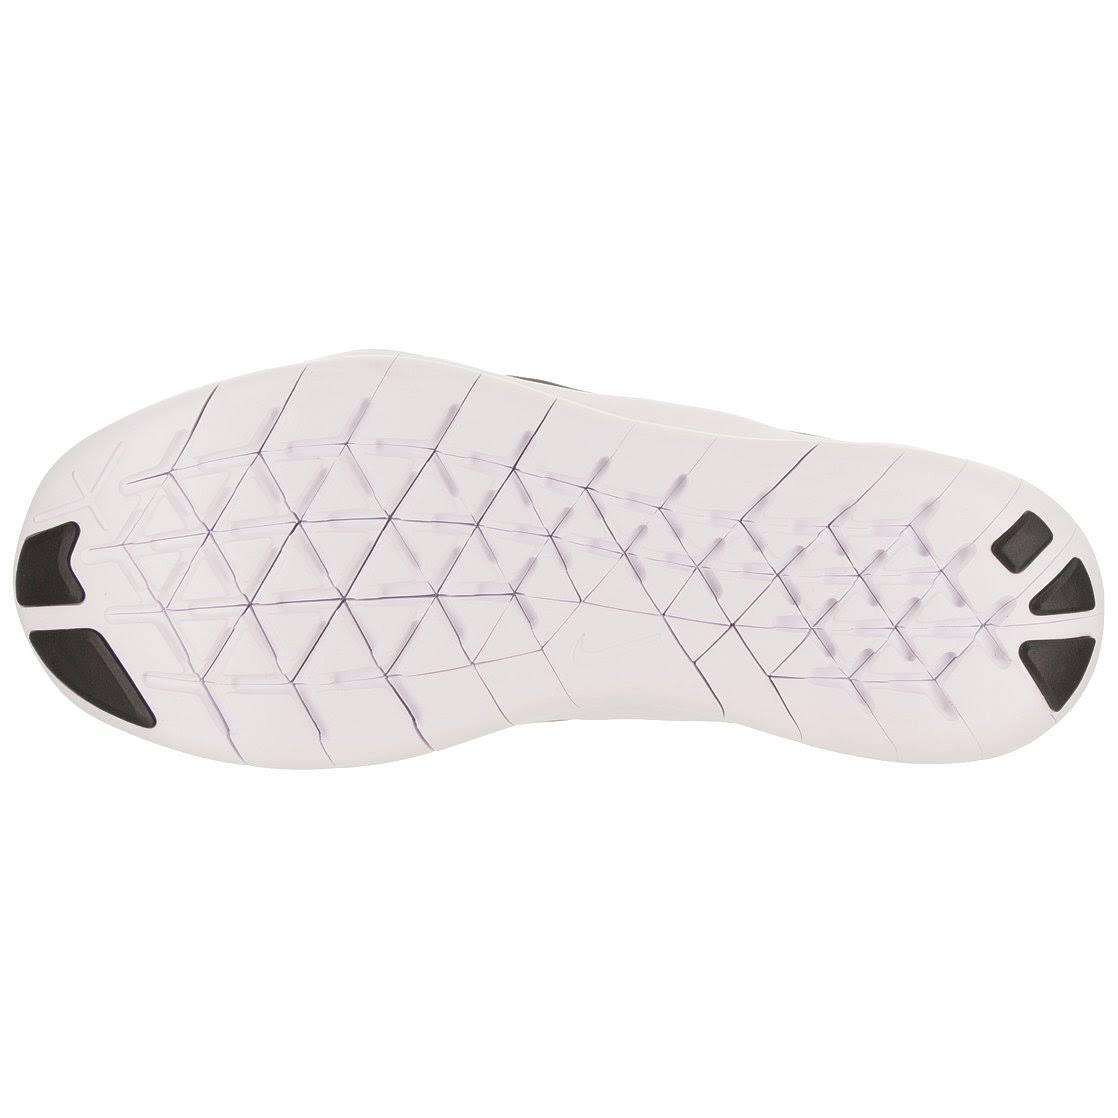 Royal Talla 5 Nike Running 8 Free Para De negro Commuter Deep Hombre 2018 Zapatillas Rn 6FqRTTnP